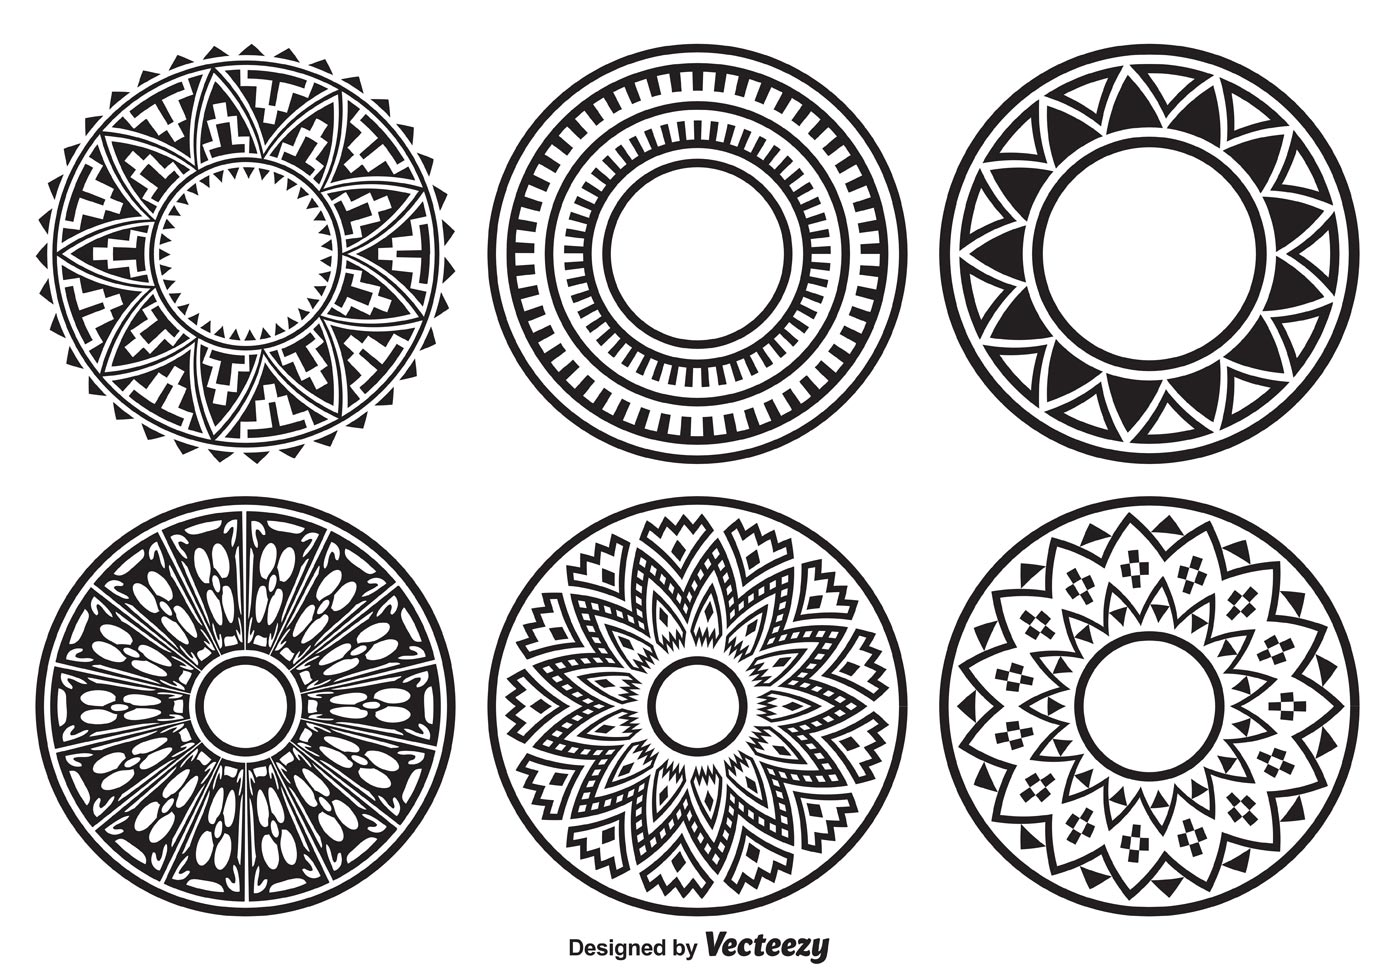 Decorated Circle Shapes